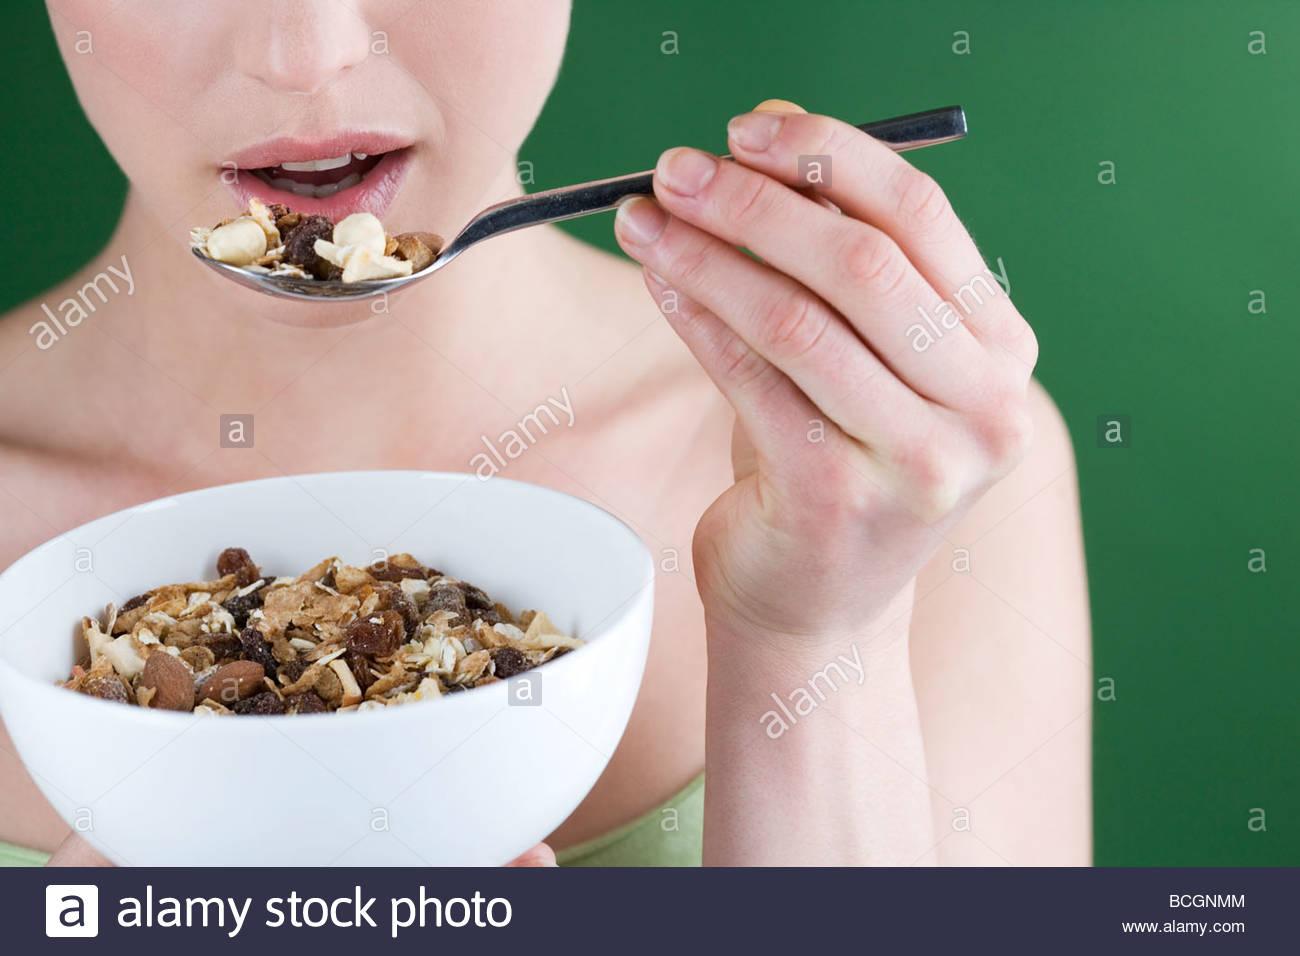 A woman eating muesli, close-up Photo Stock